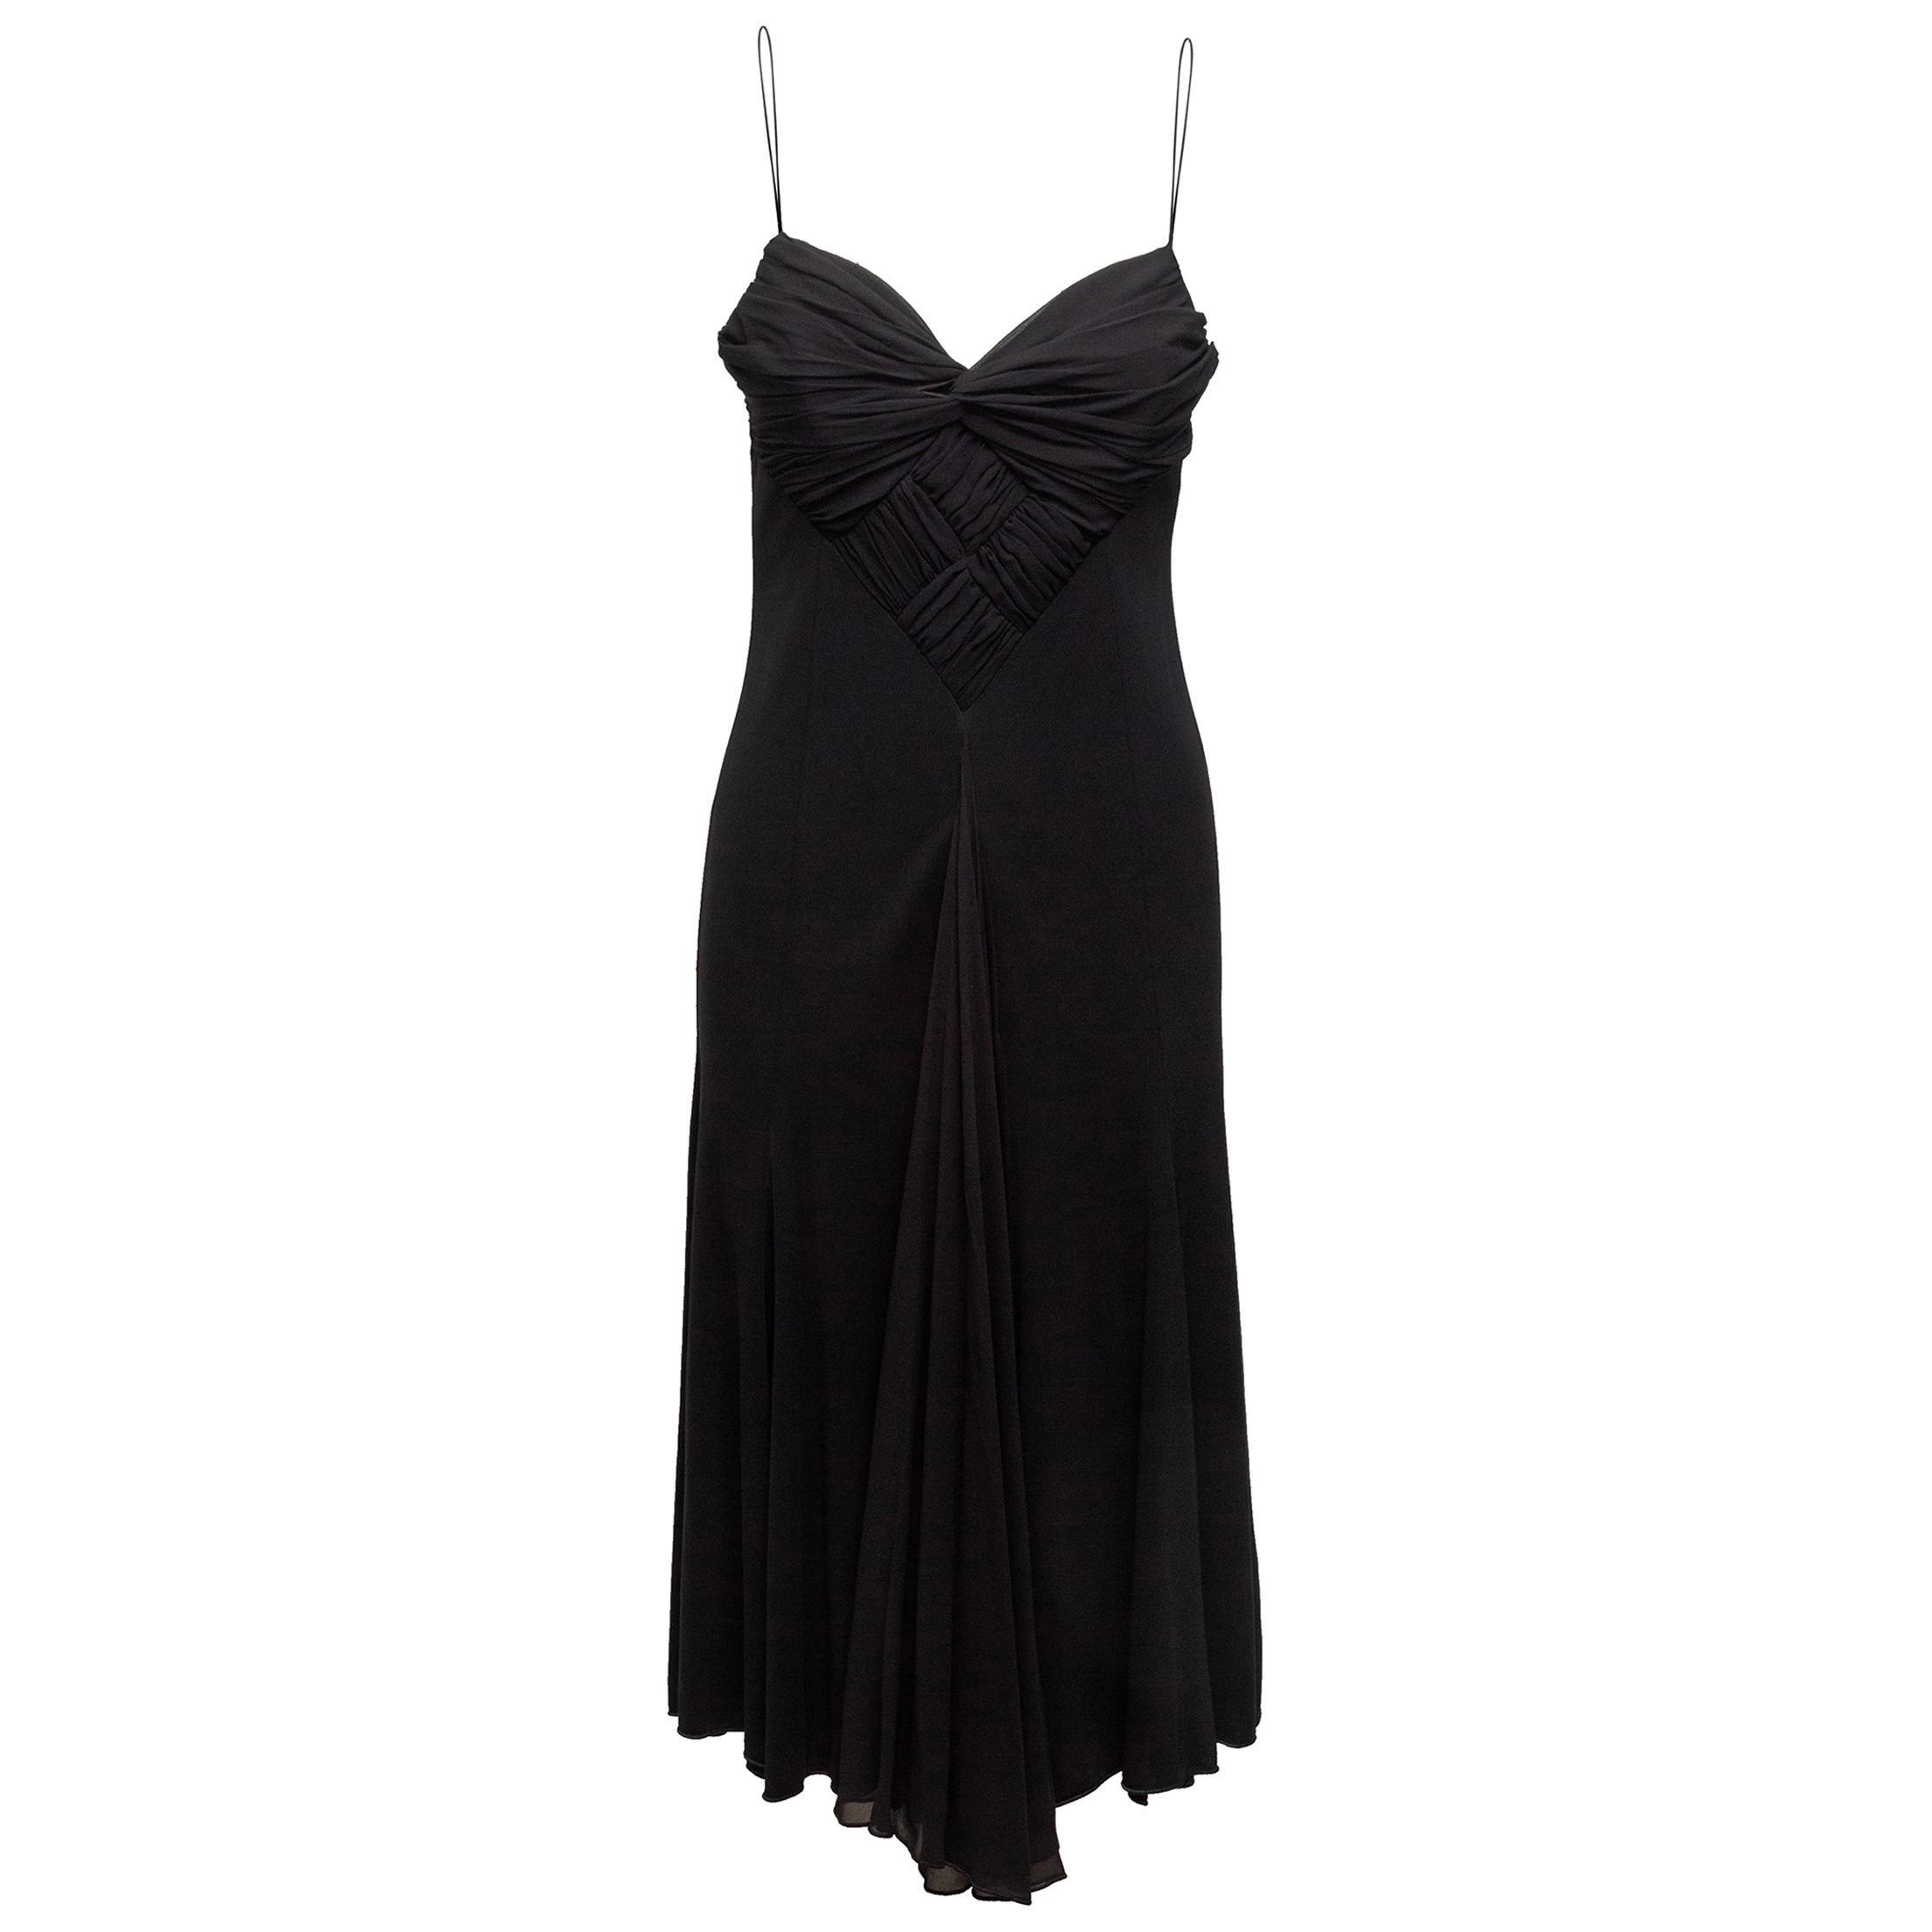 Armani Collezioni Black Sleeveless Evening Gown